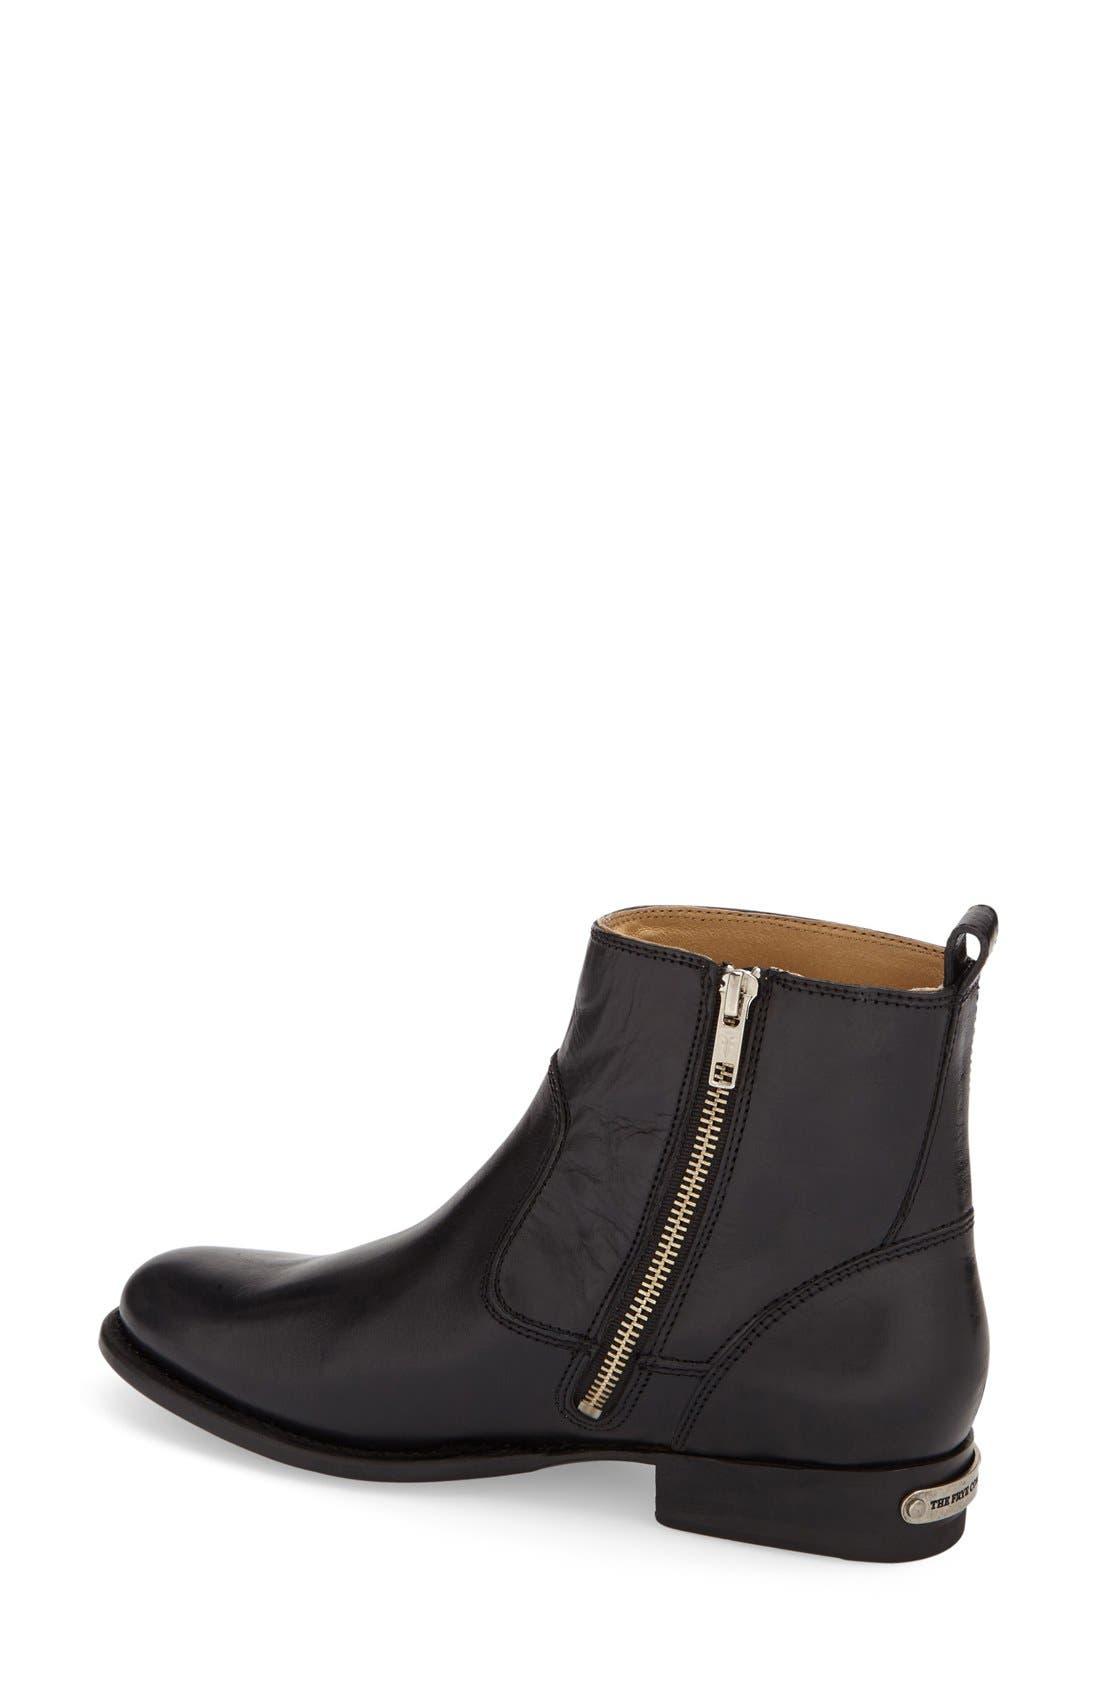 'Danielle' Ankle Boot,                             Alternate thumbnail 4, color,                             001